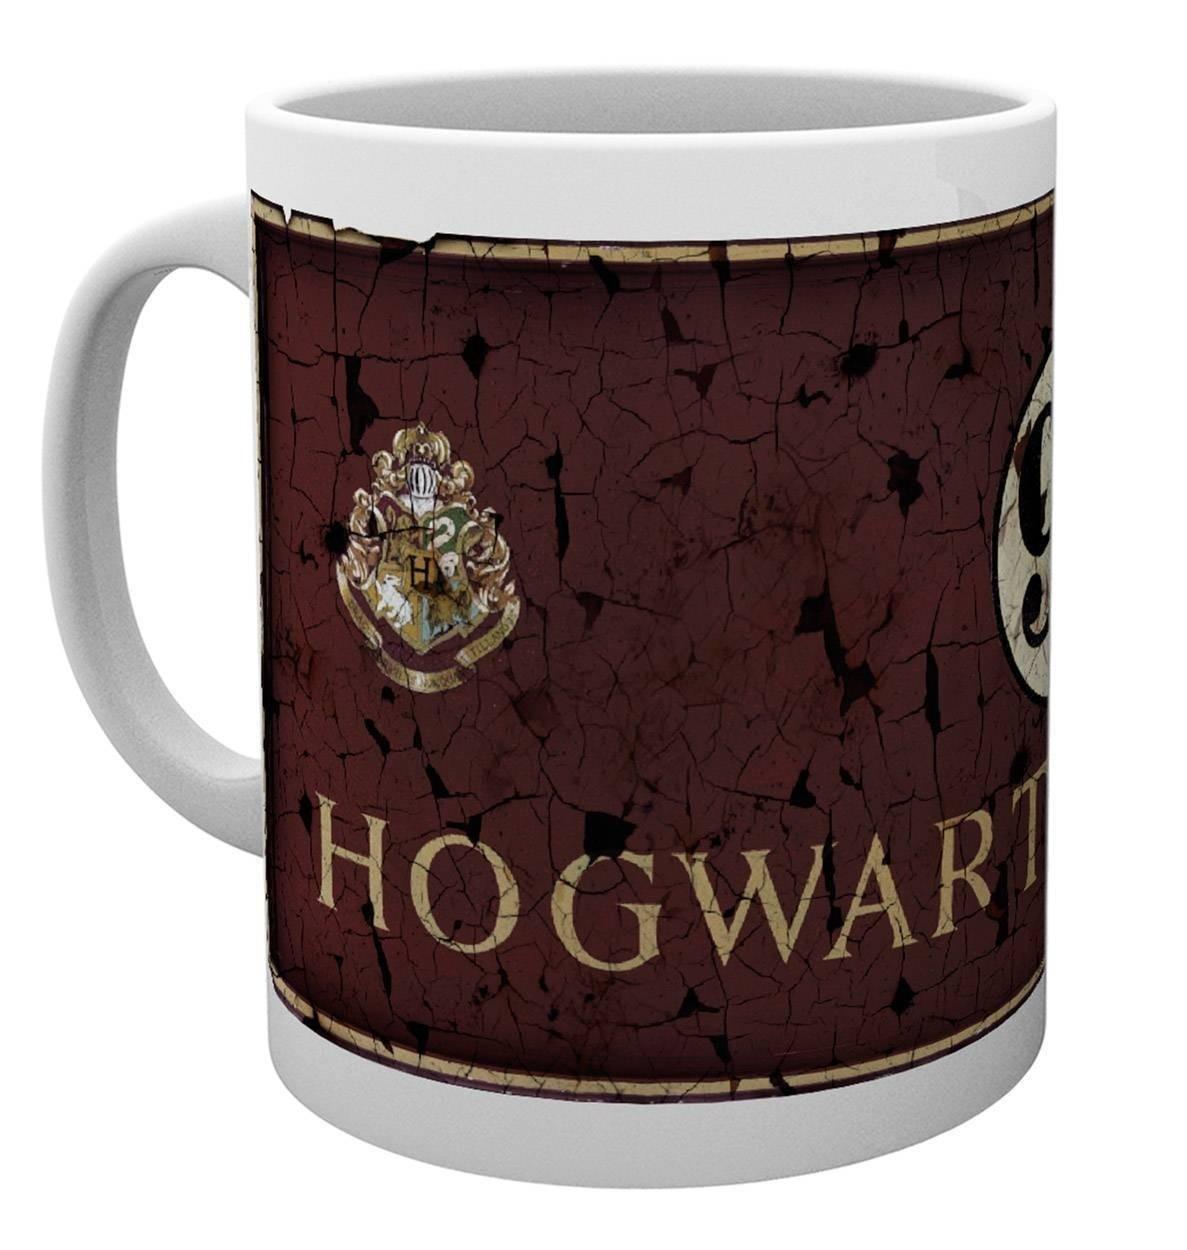 Harry Potter - Mug 300 ml - Platform 9 3/4